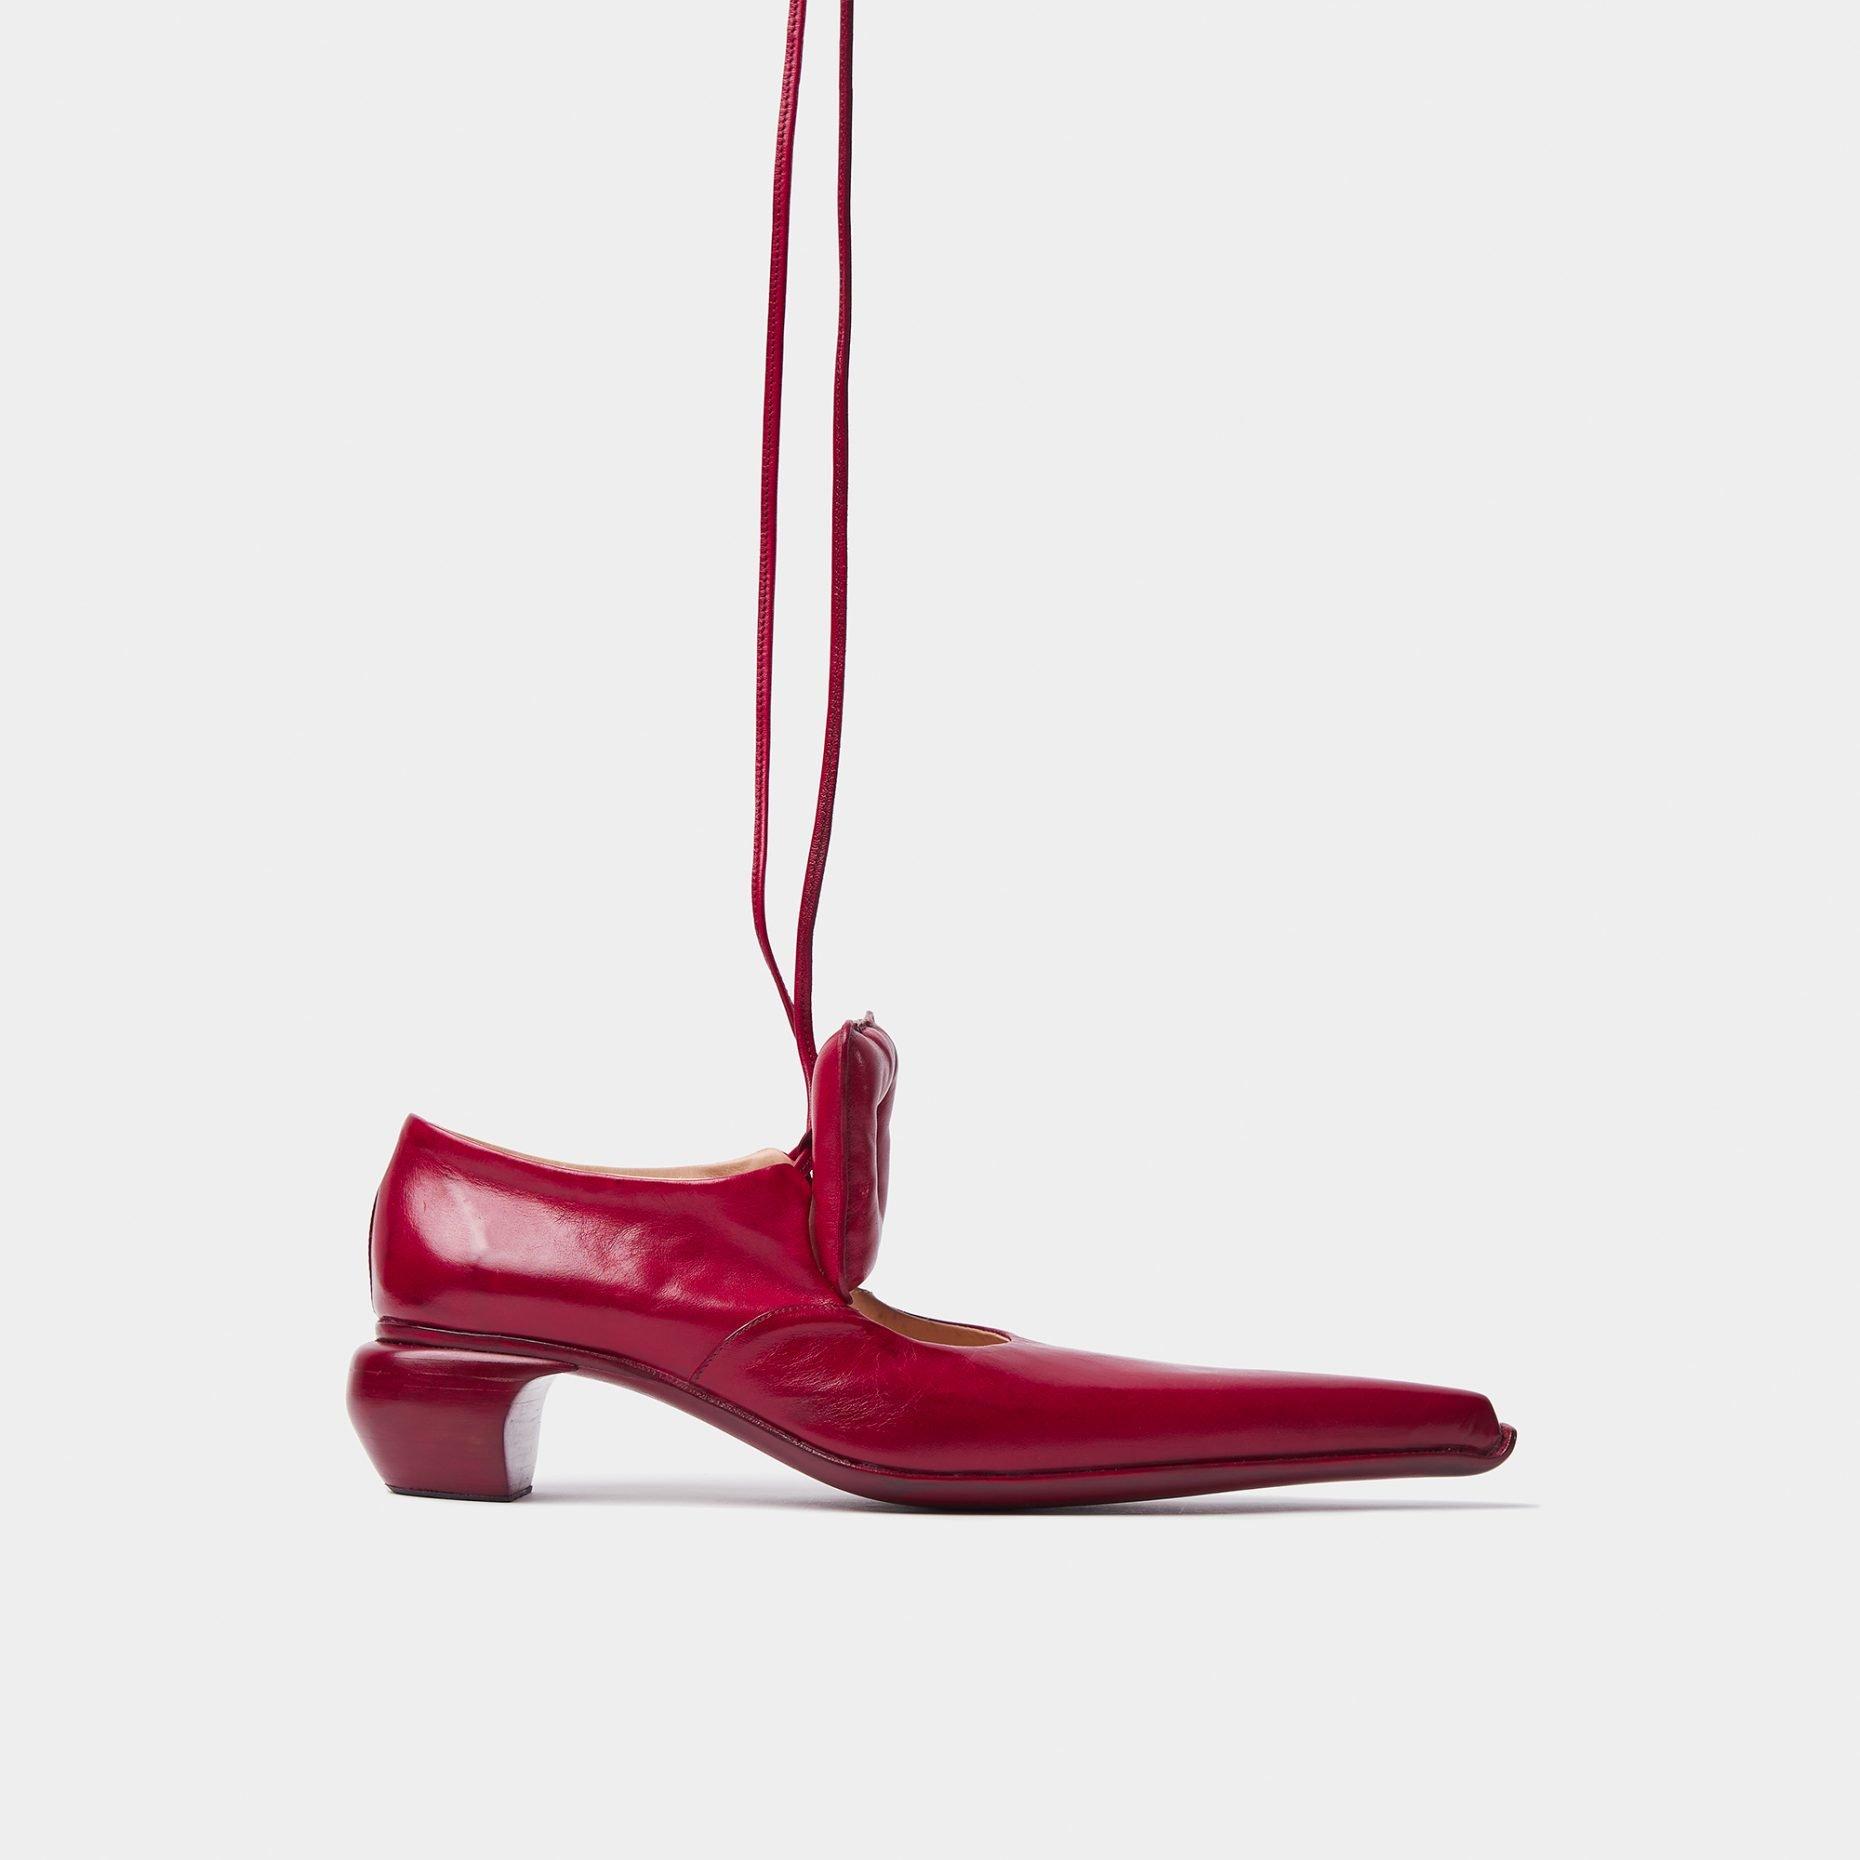 Jordan Dalah Studio x Actually Existing Detachable Cushion Shoe